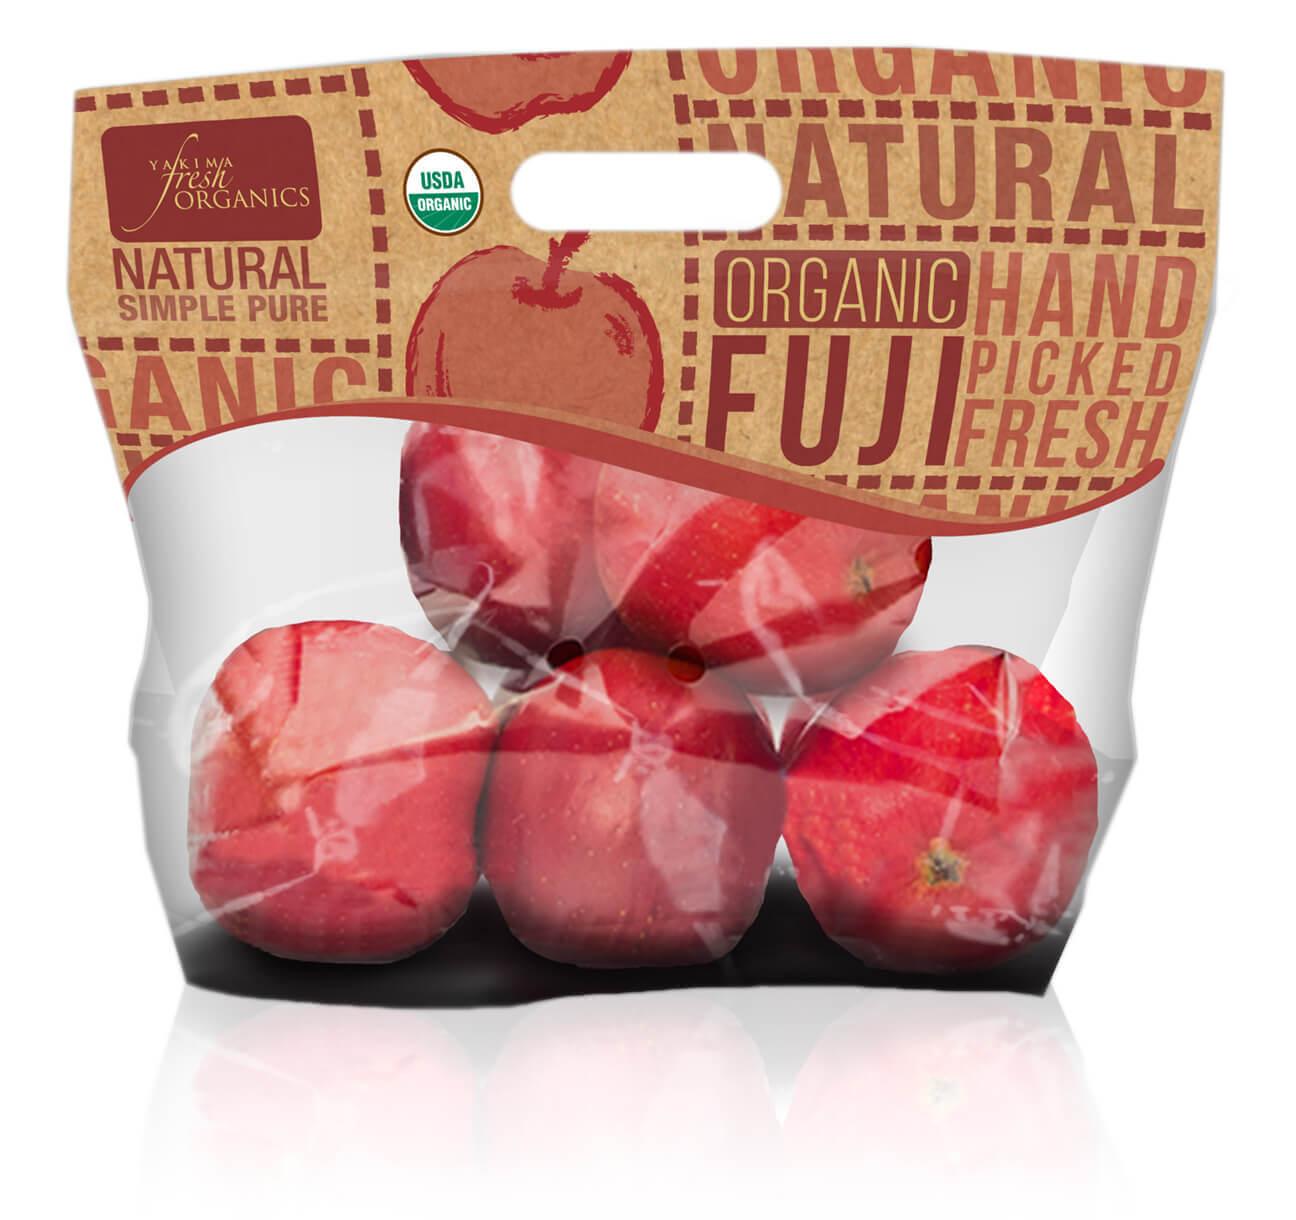 YFM-Organic-Fuji-gussetbag-front.jpg